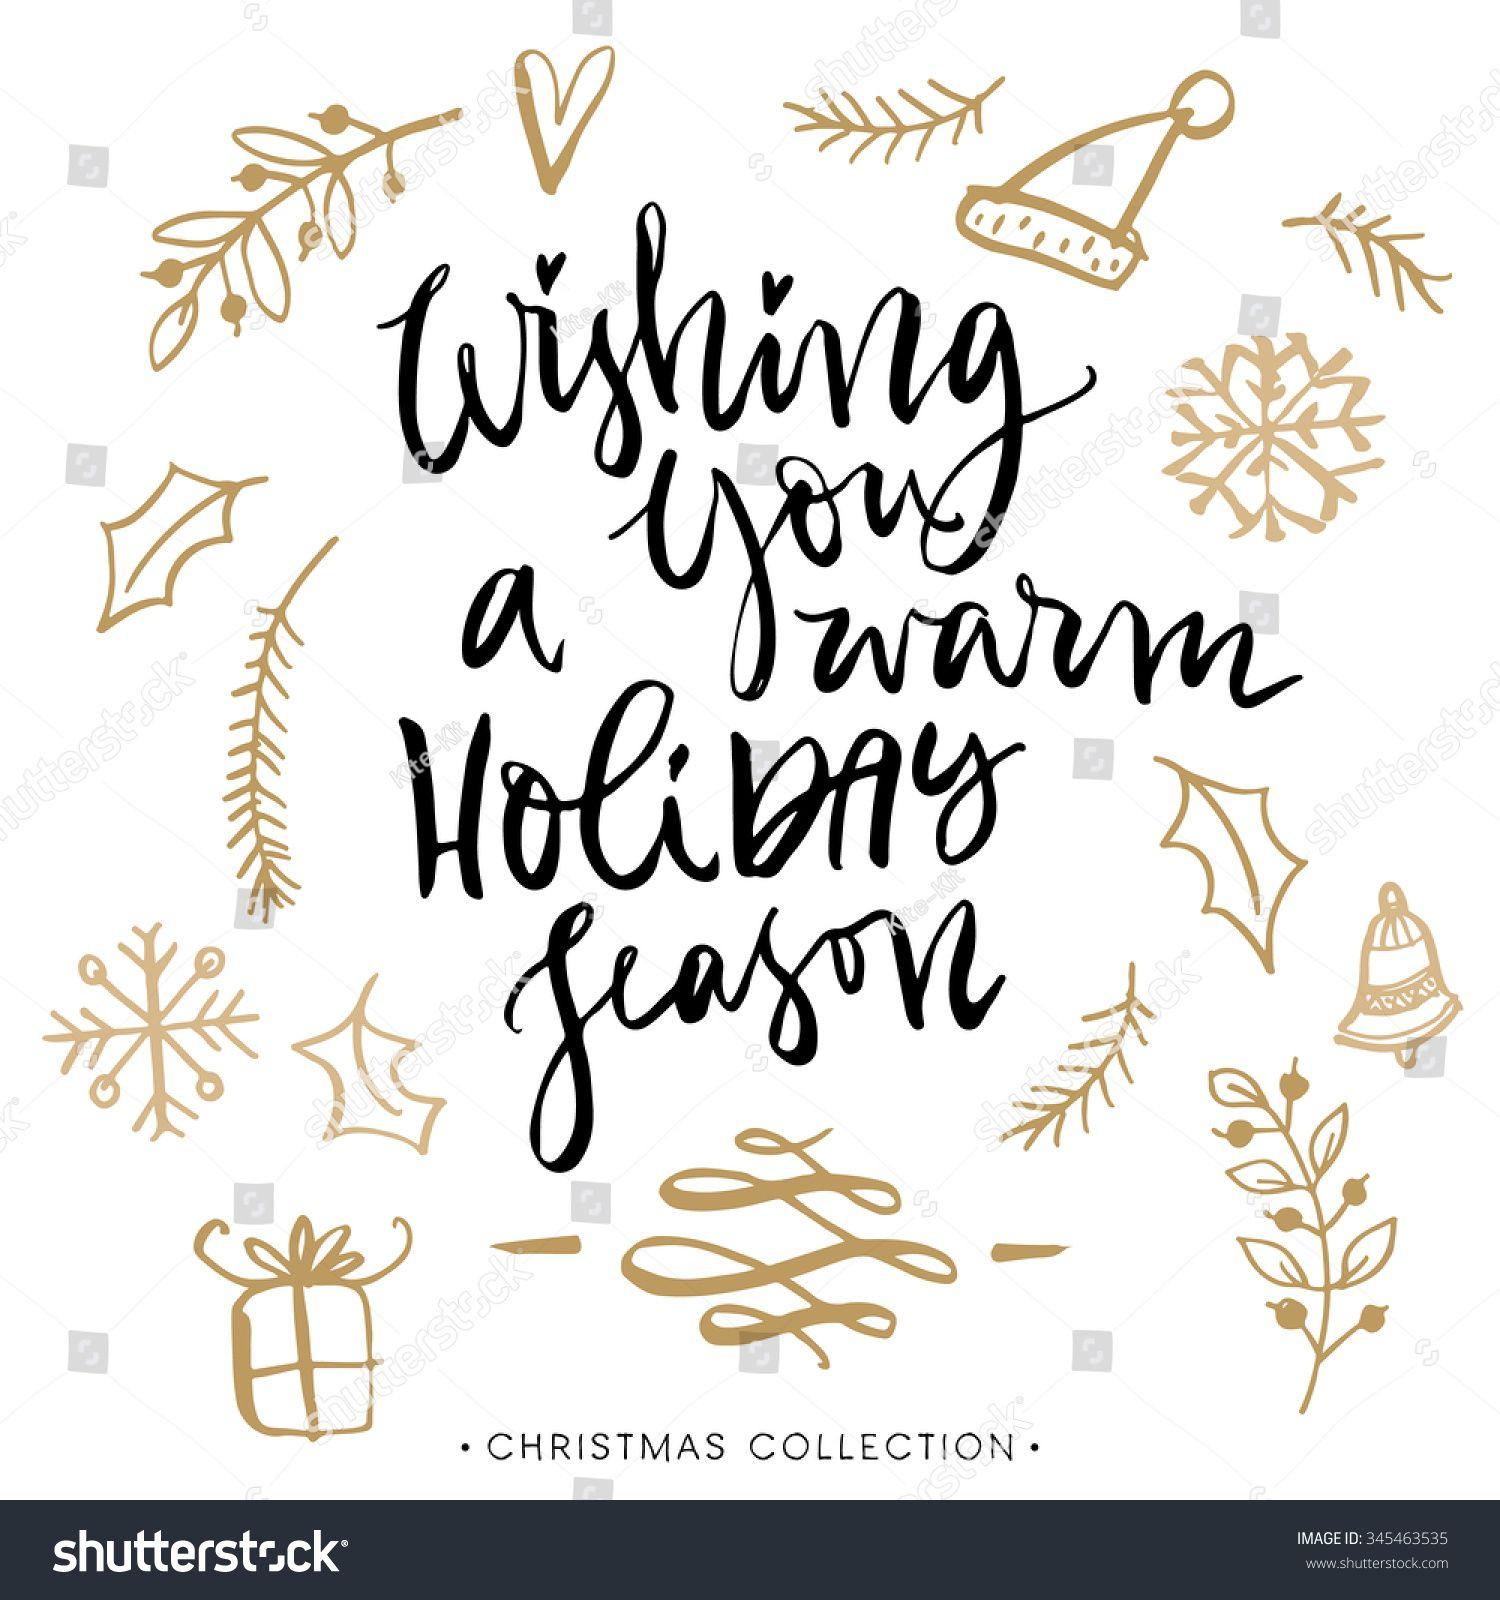 Wishing you a warm holiday season christmas greeting card with wishing you a warm holiday season christmas greeting card with calligraphy handwritten modern brush kristyandbryce Gallery